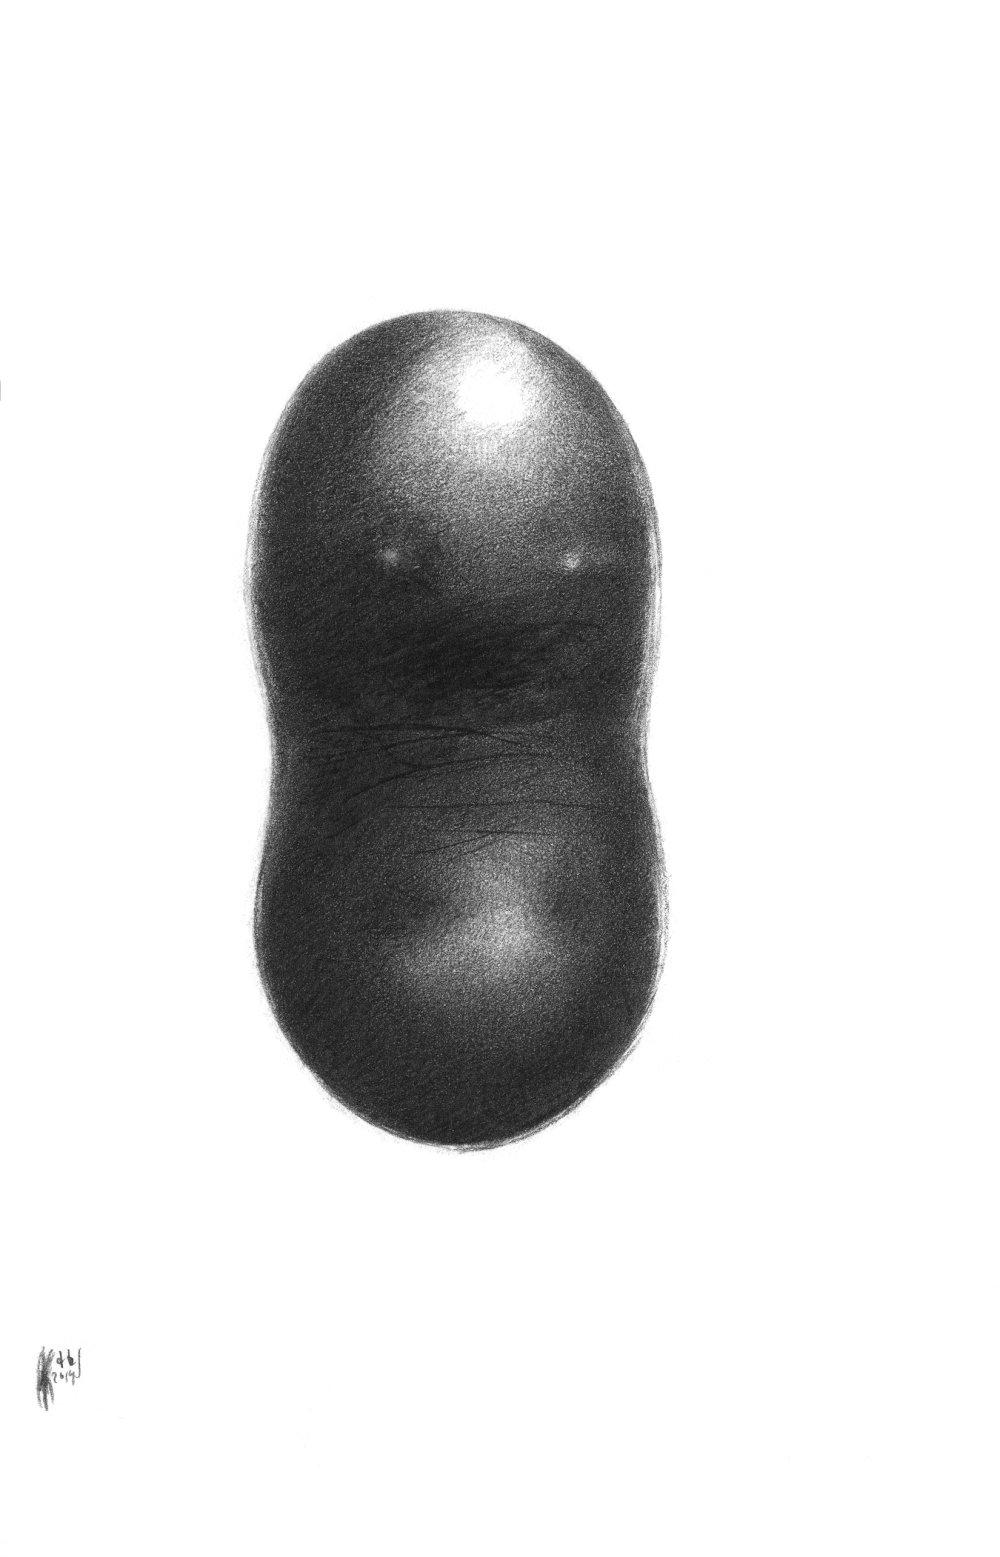 Ležatá osmička, 2014, kresba ceruzkou, 217x140mm